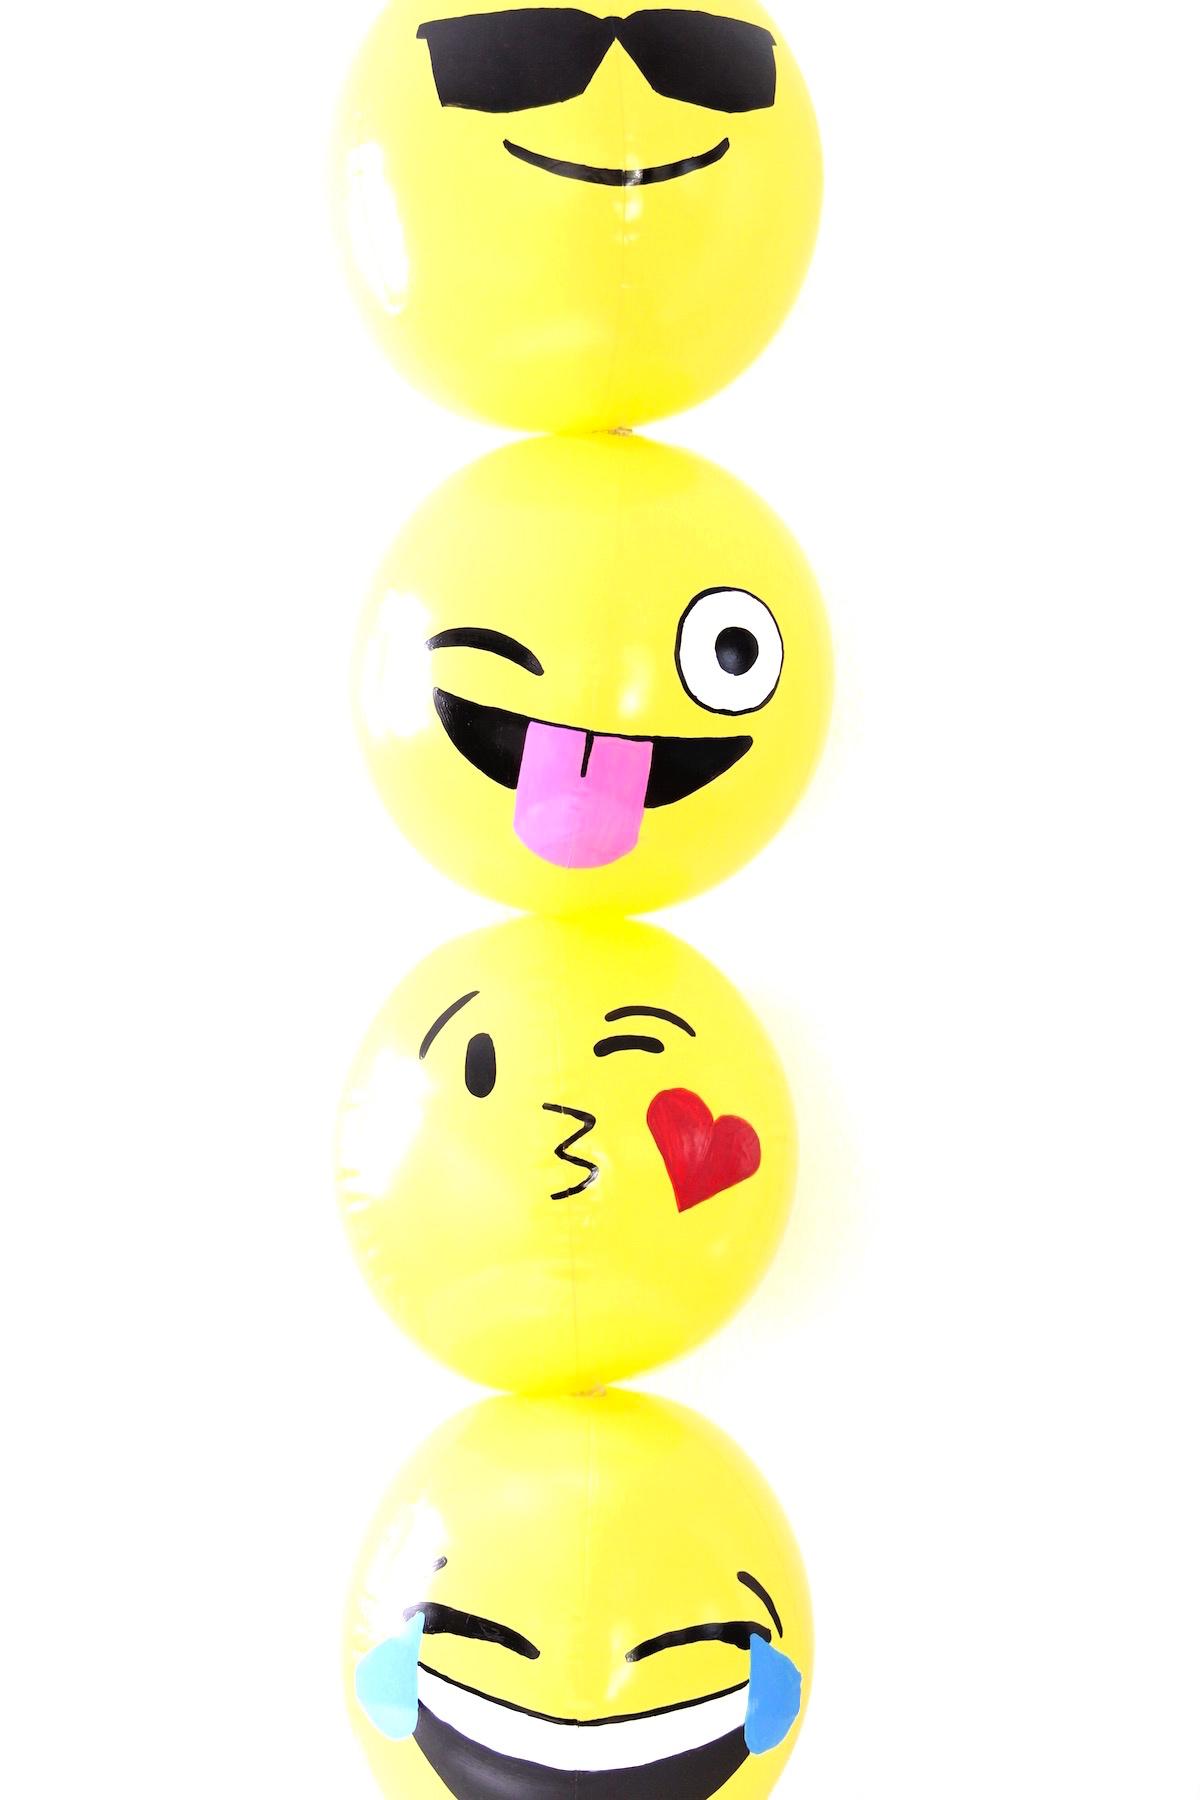 Beach Ball Emoji : beach, emoji, EMOJI, BEACH, BALLS